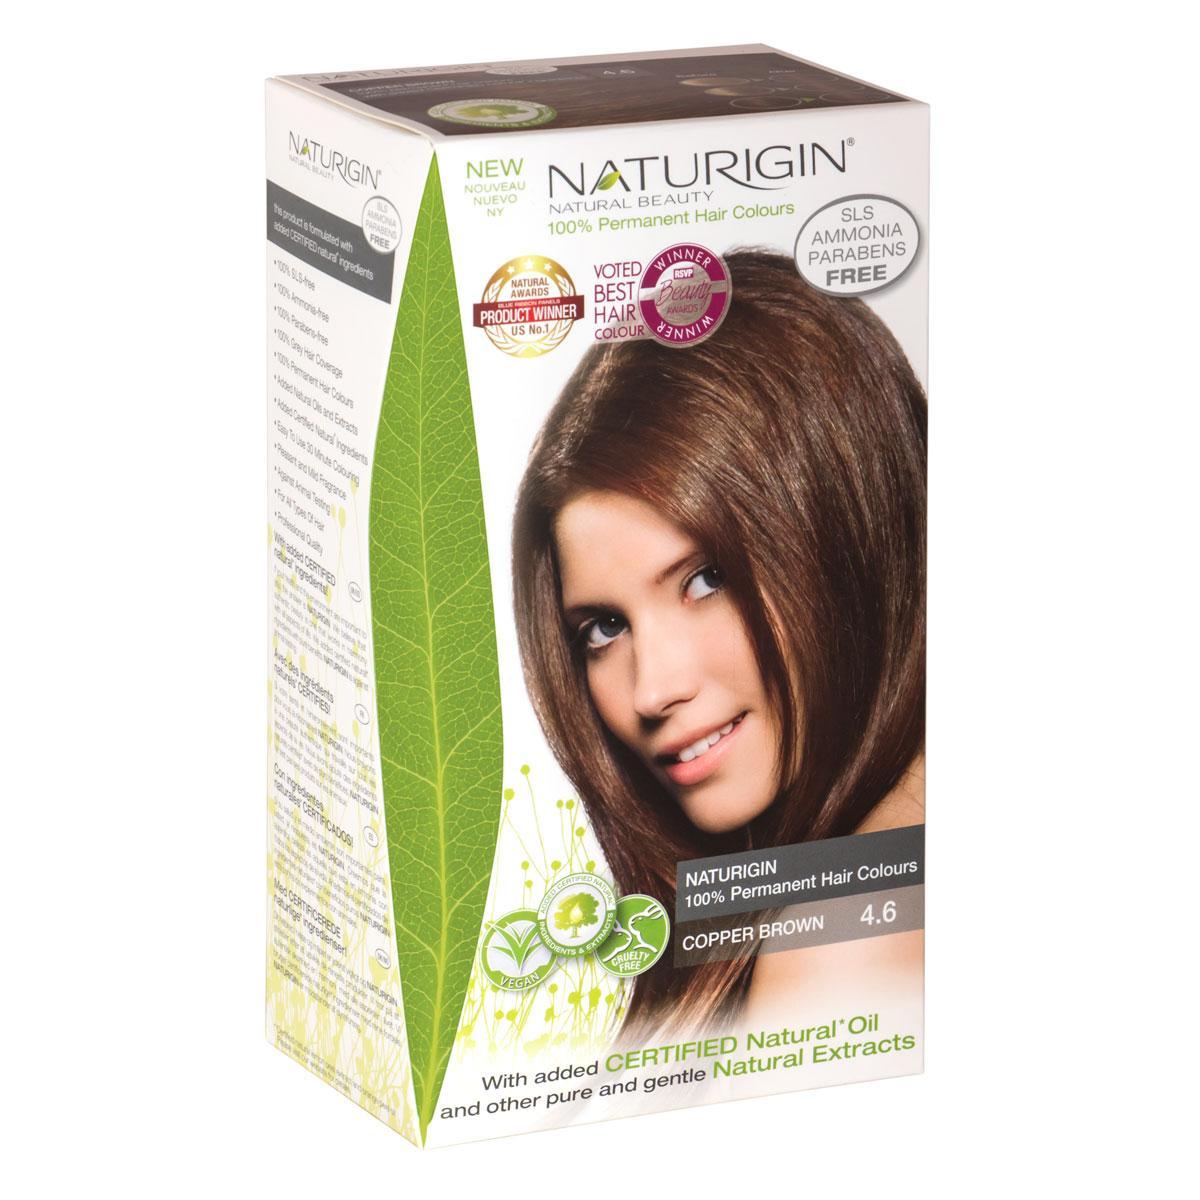 Buy Naturigin 4 6 Copper Brown 100 Permanent Organic Hair Colour Online Singapore